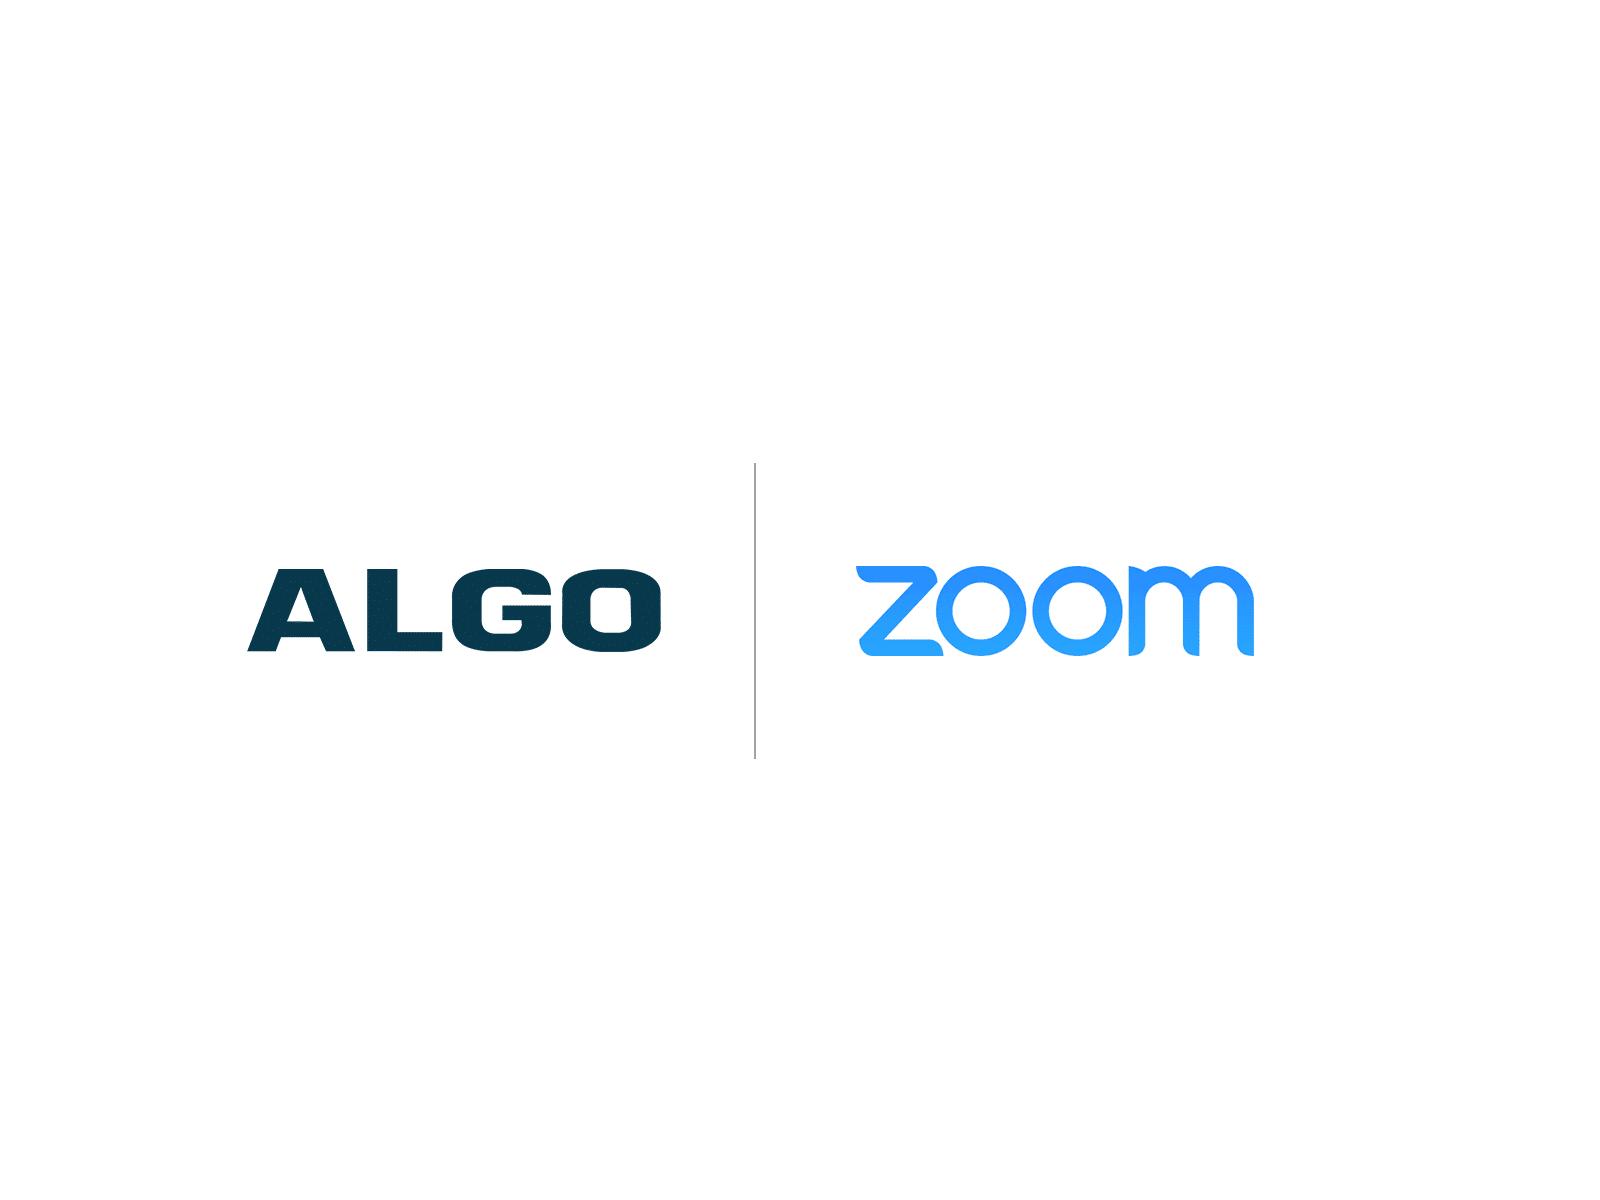 Algo Zoom Compatibility Logo